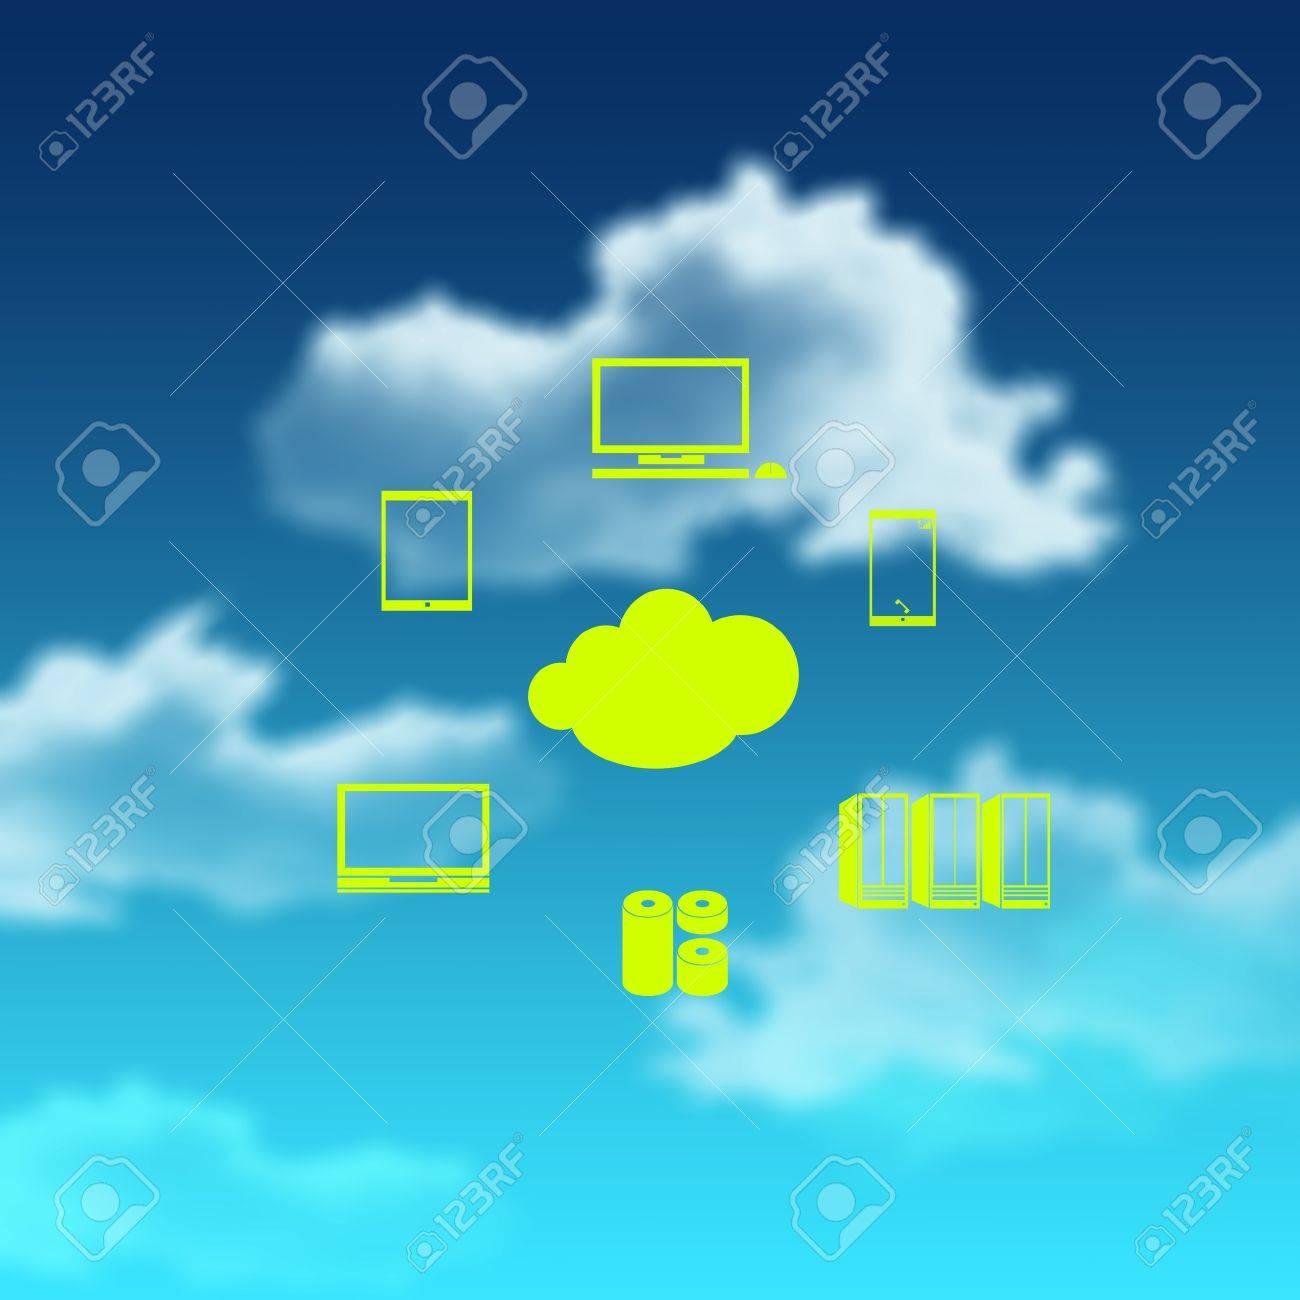 a Cloud Computing diagram as concept Stock Photo - 18237265